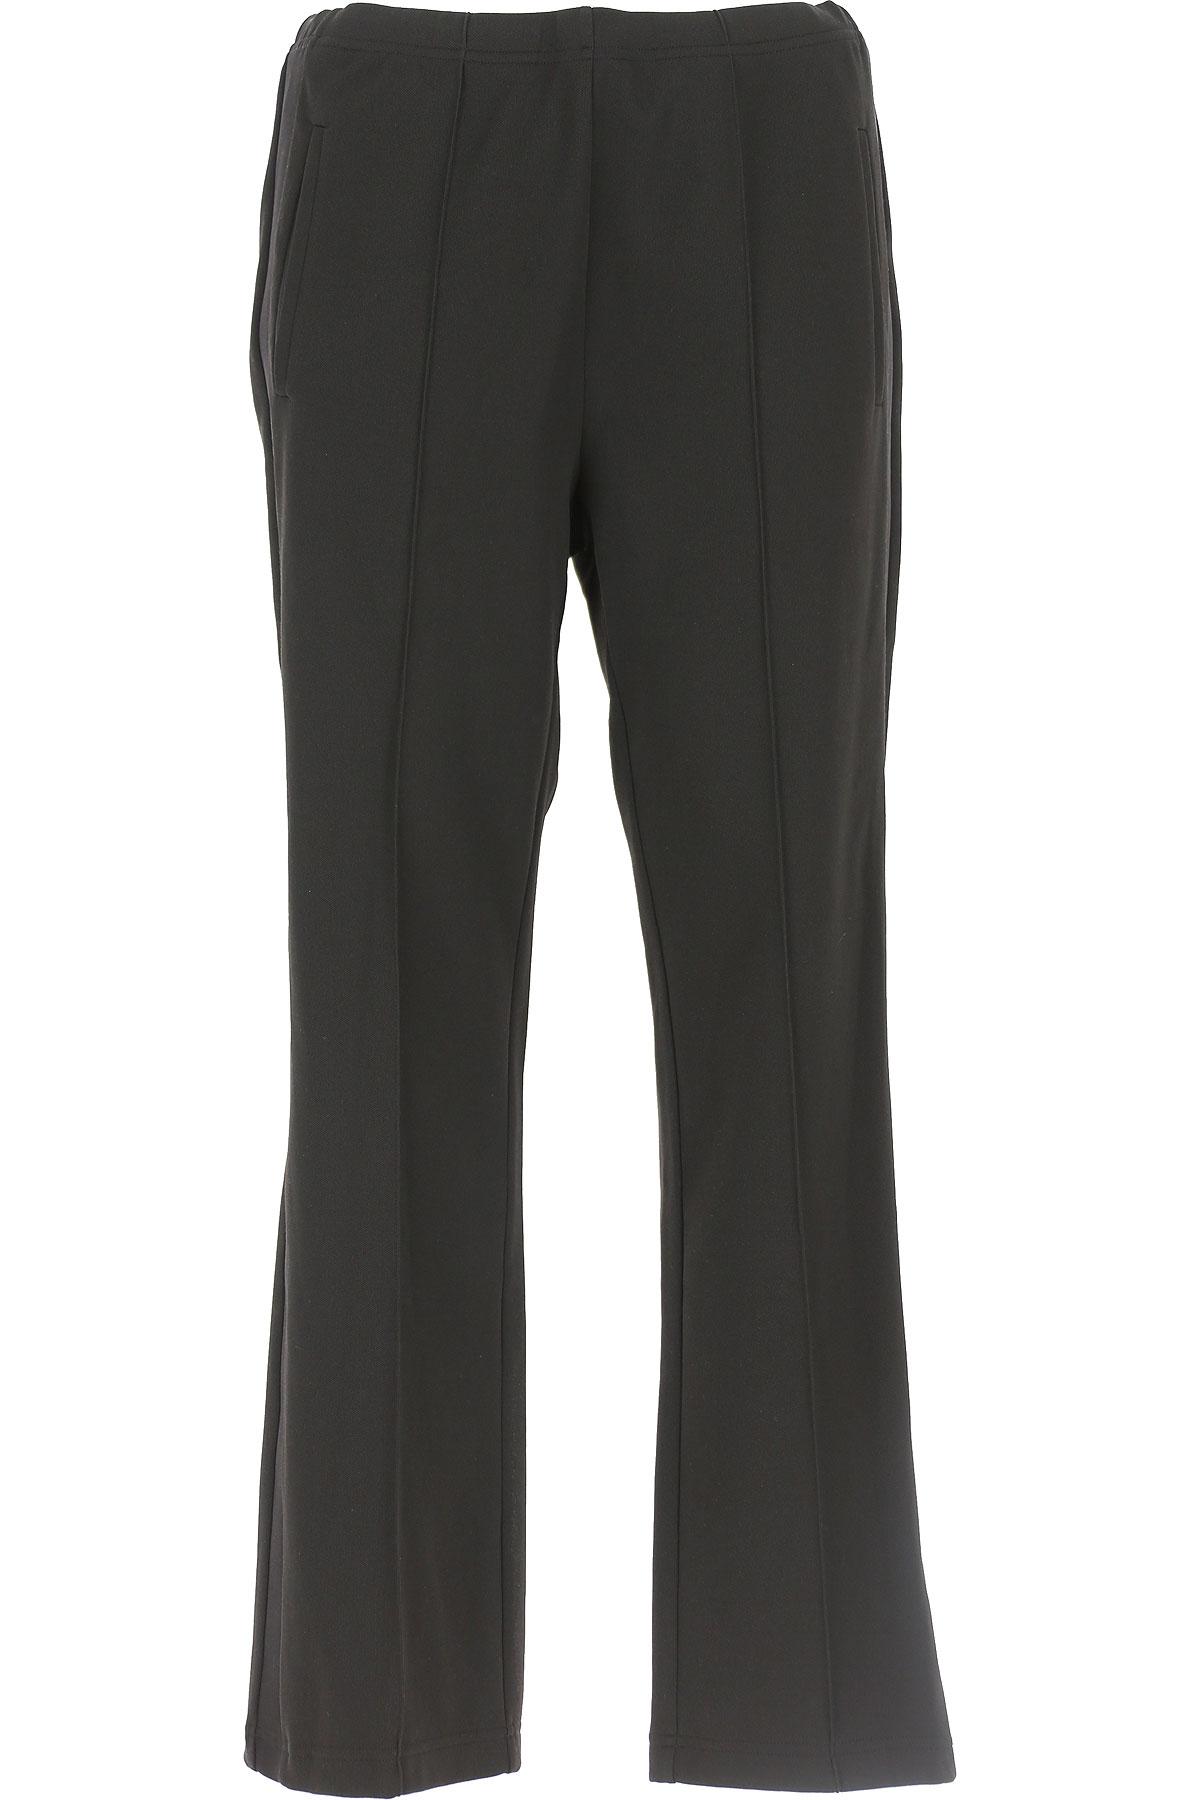 Maison Martin Margiela Pants for Men On Sale in Outlet, Black, polyester, 2019, 32 34